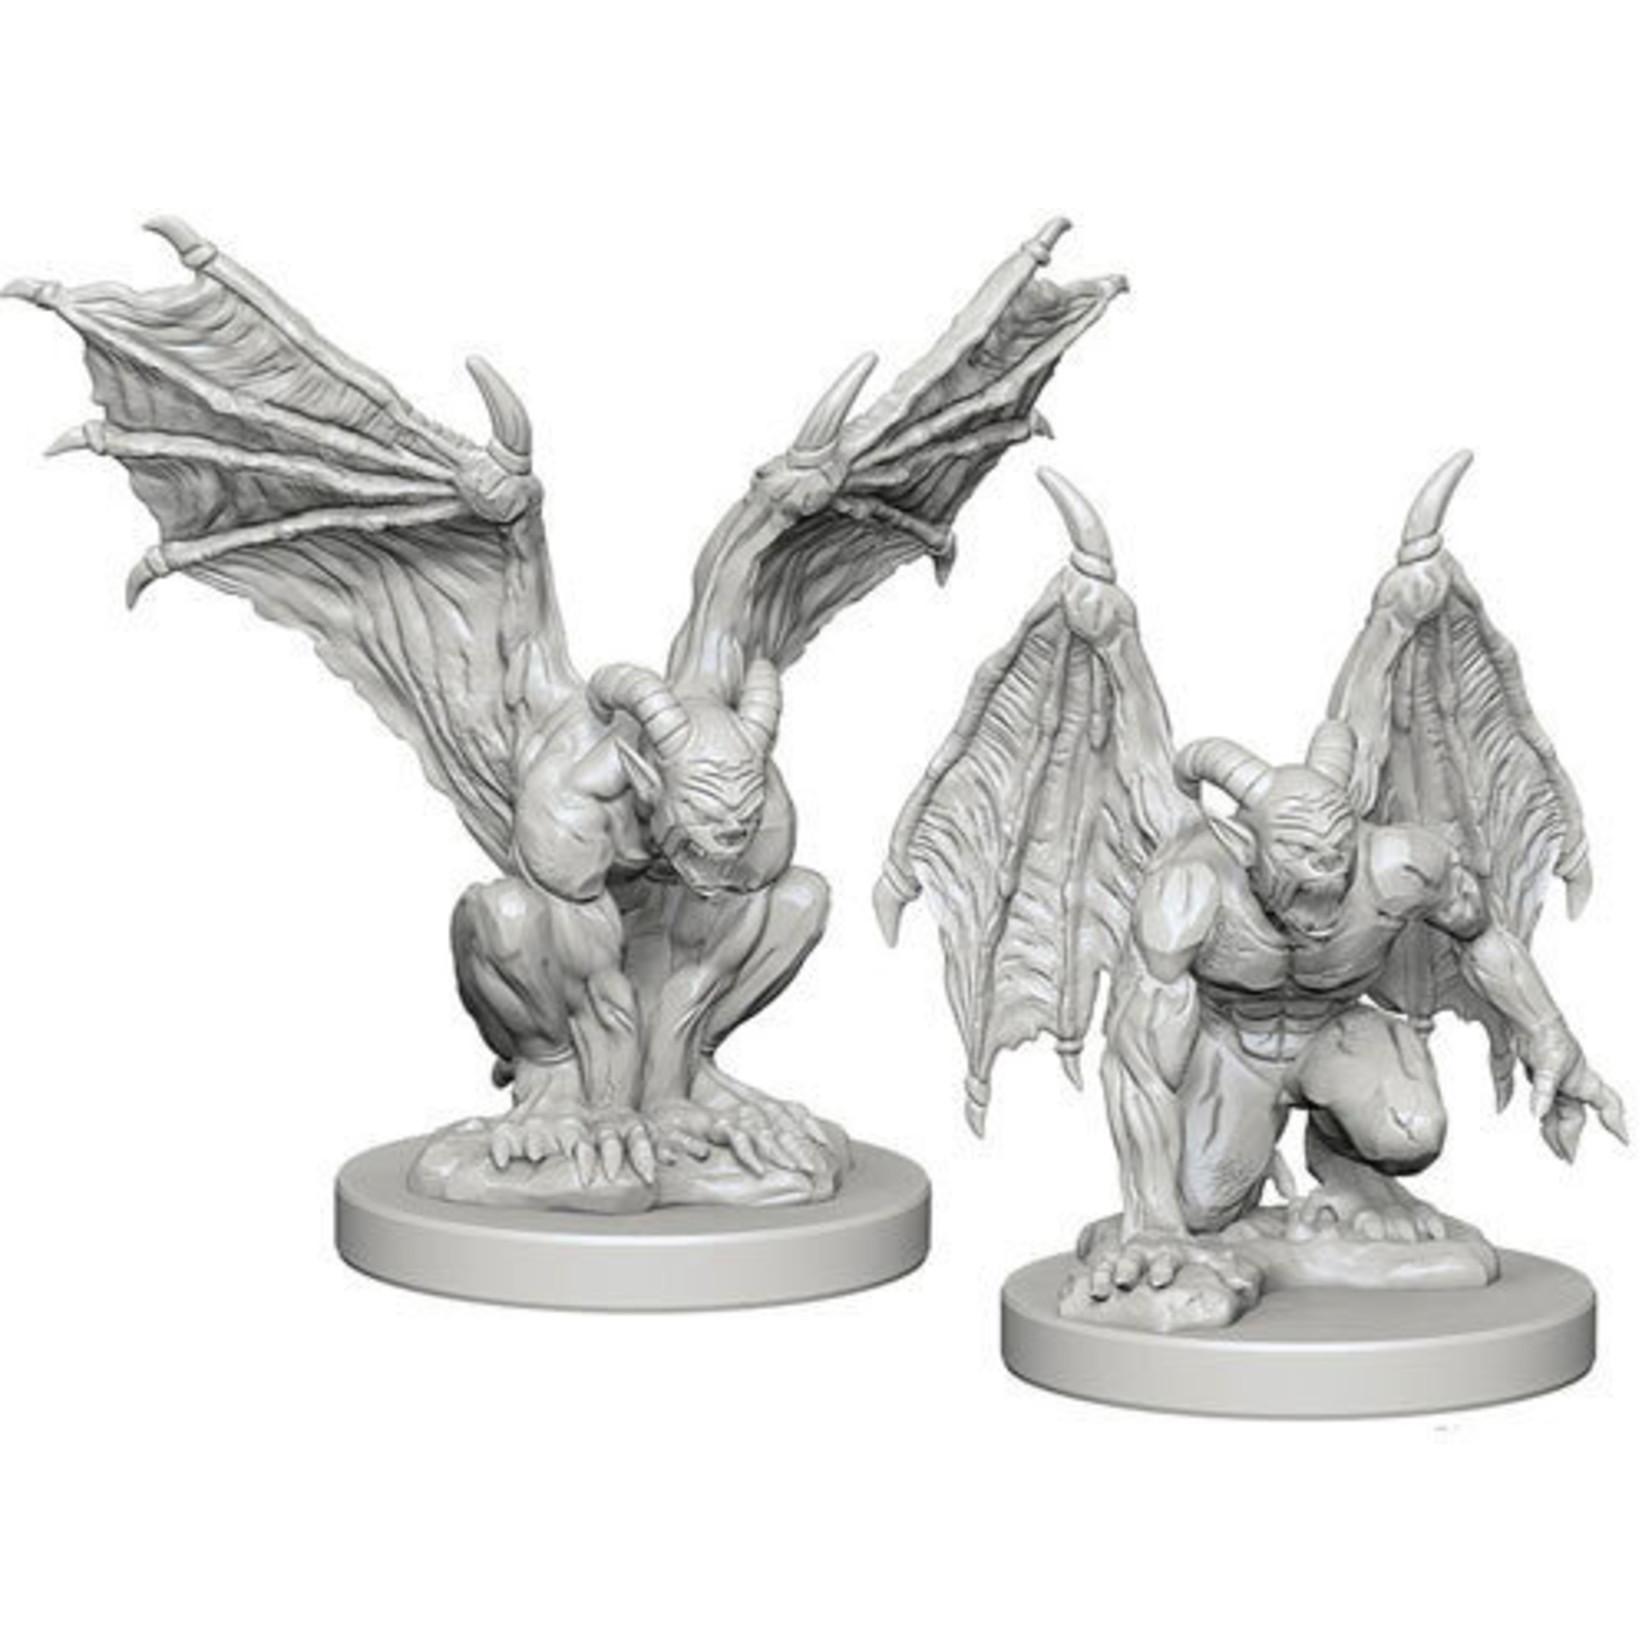 WizKids/Neca 72561 Nolzur's Gargoyles